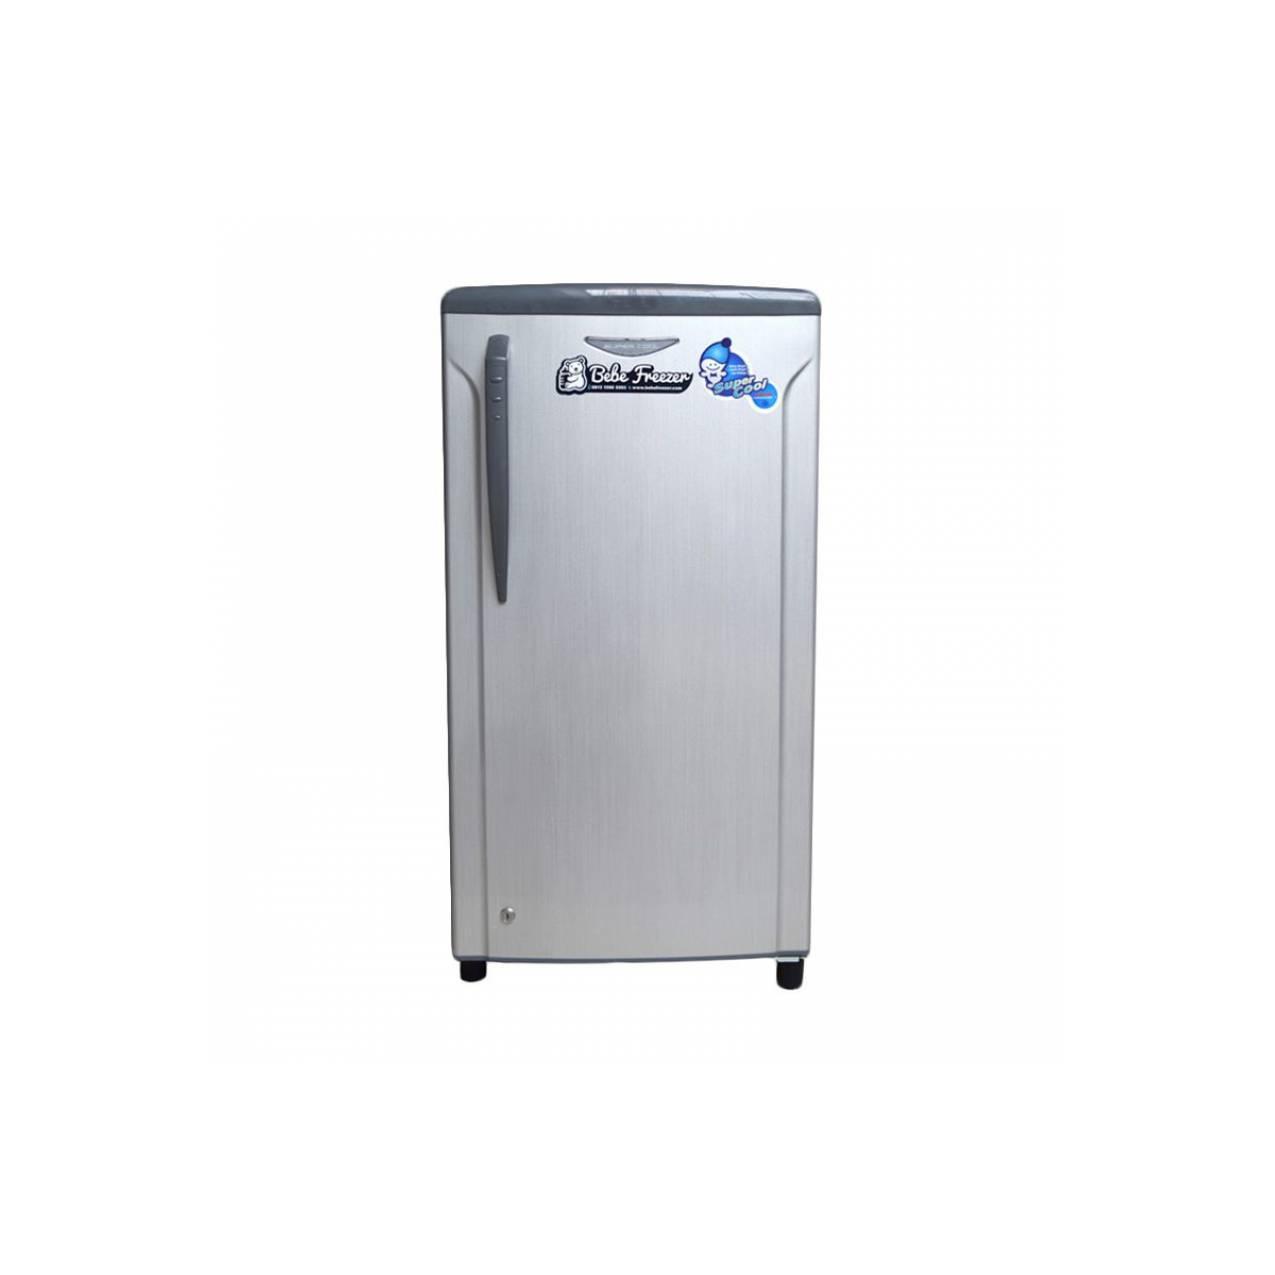 Sewa Freezer ASI 6 Bulan Area Sidoarjo